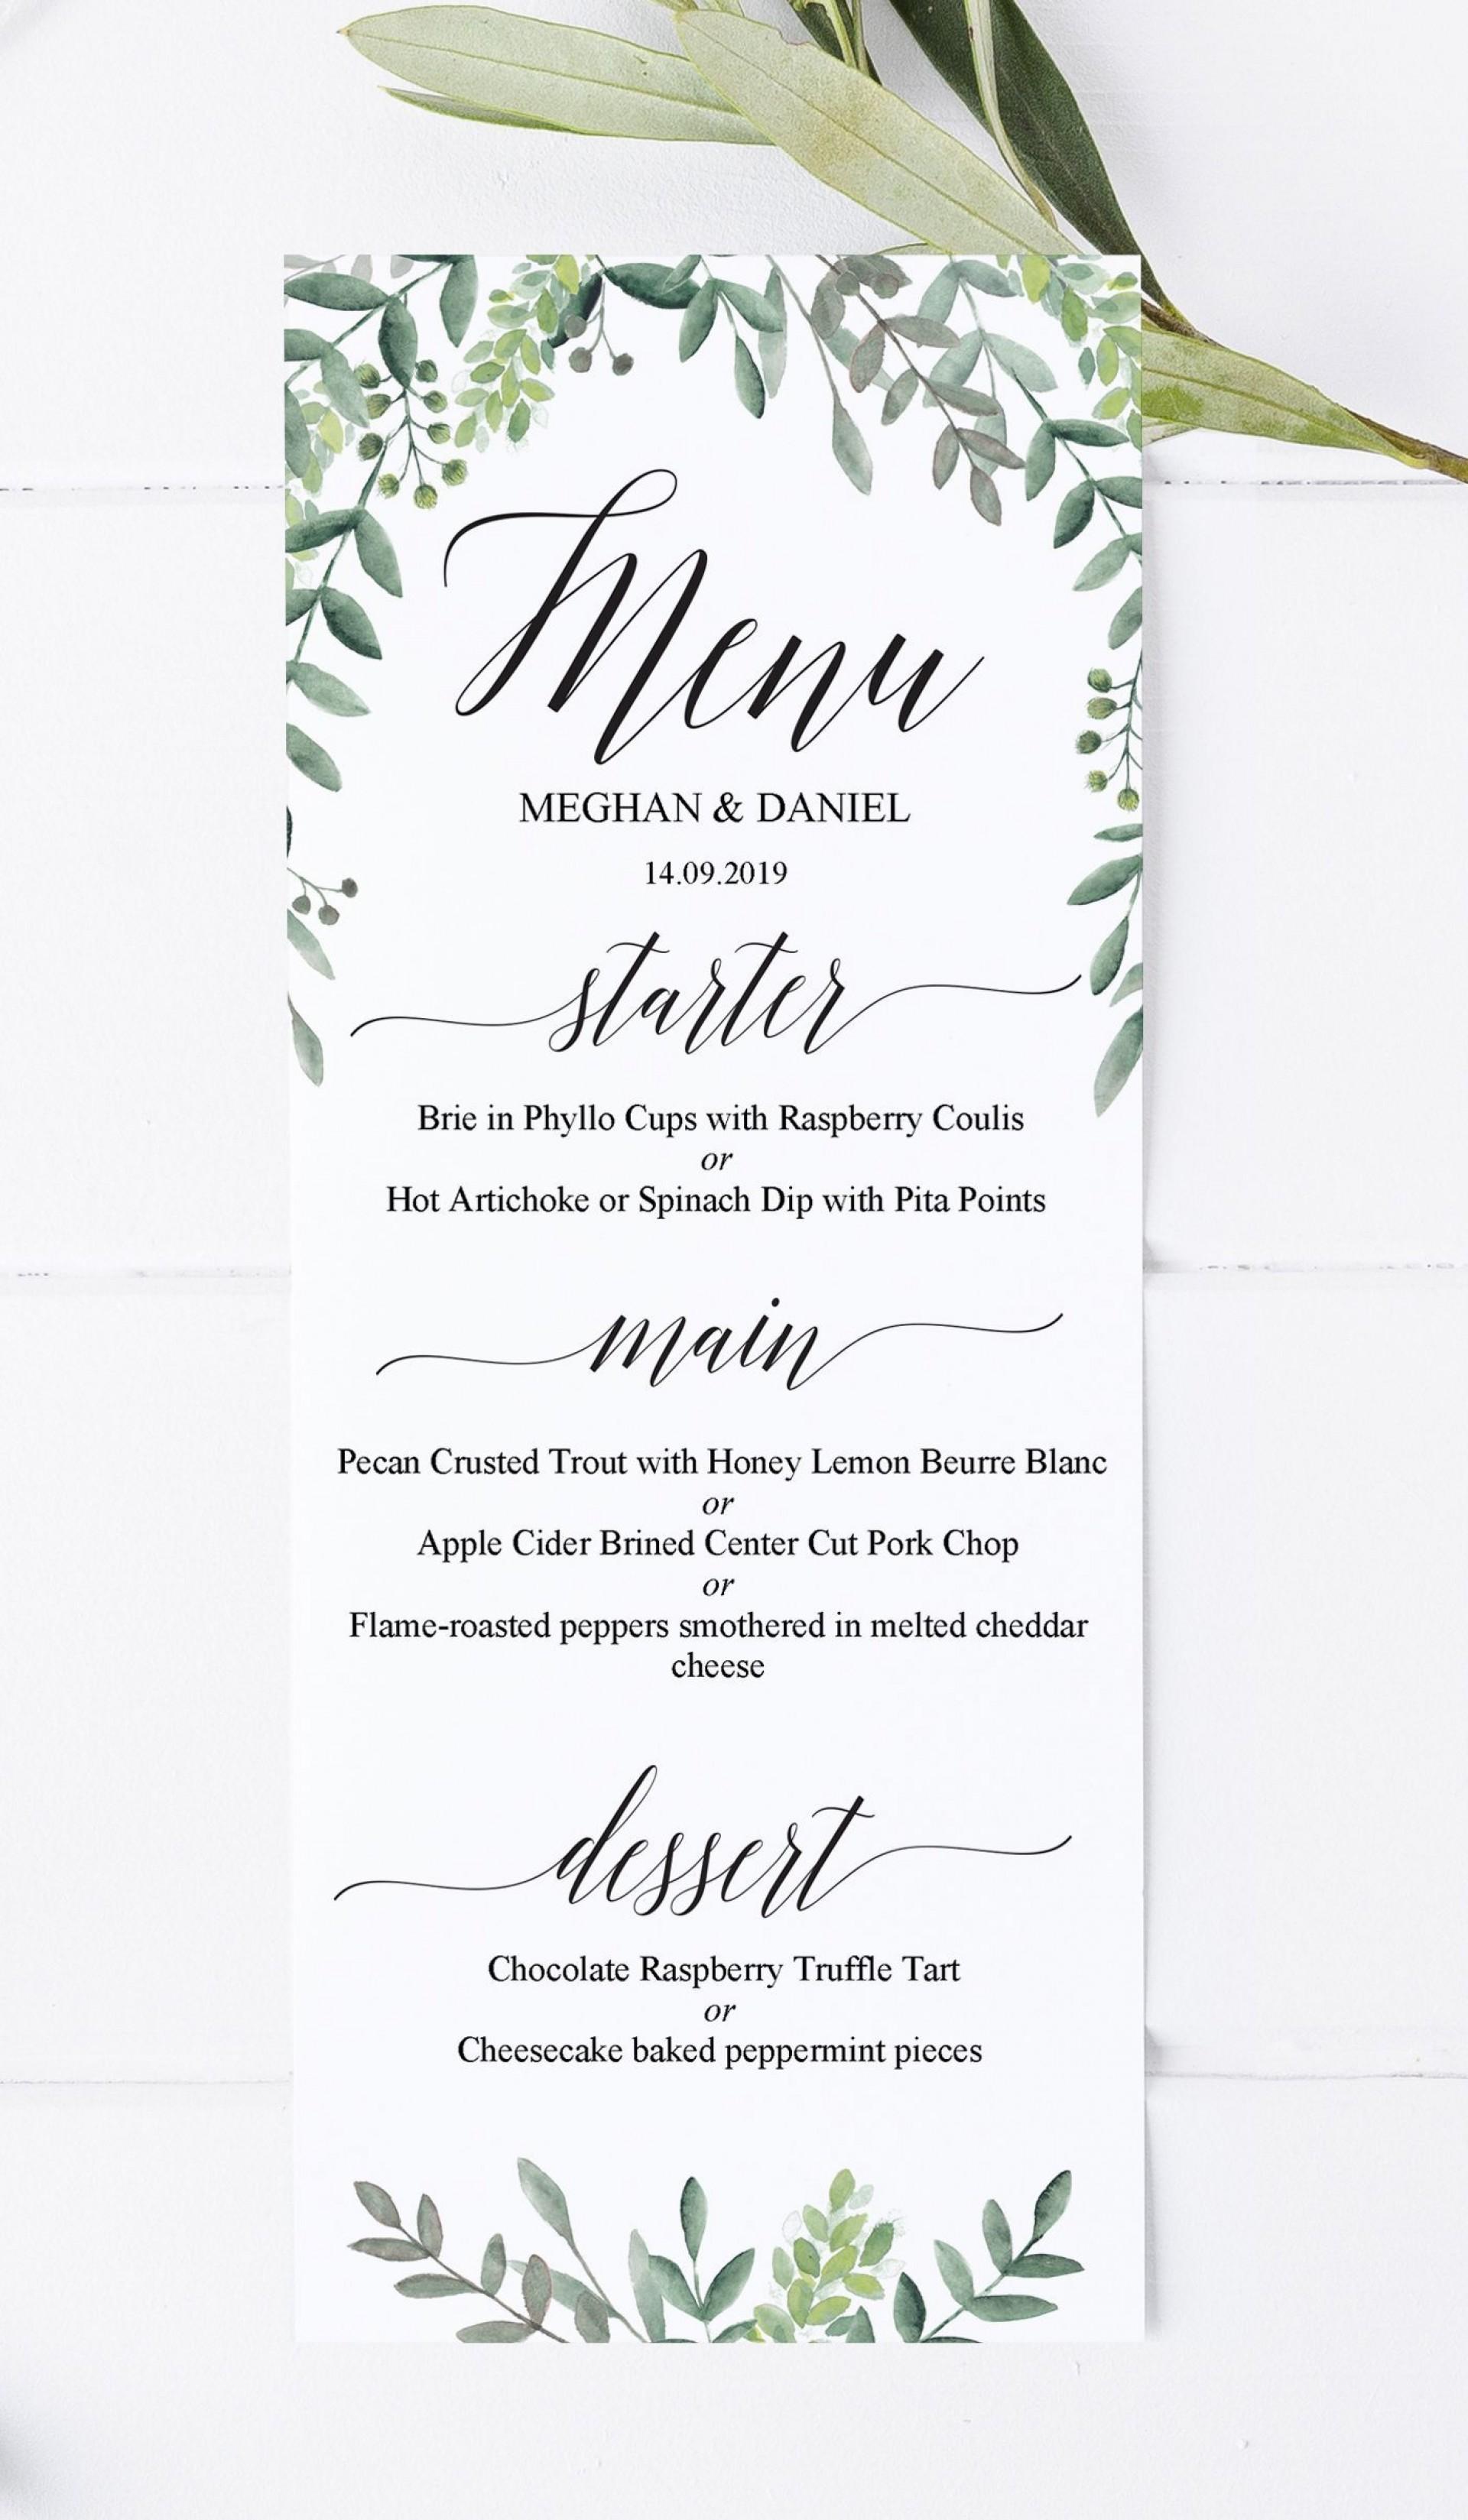 000 Marvelou Diy Wedding Menu Template Sample  Free Card1920